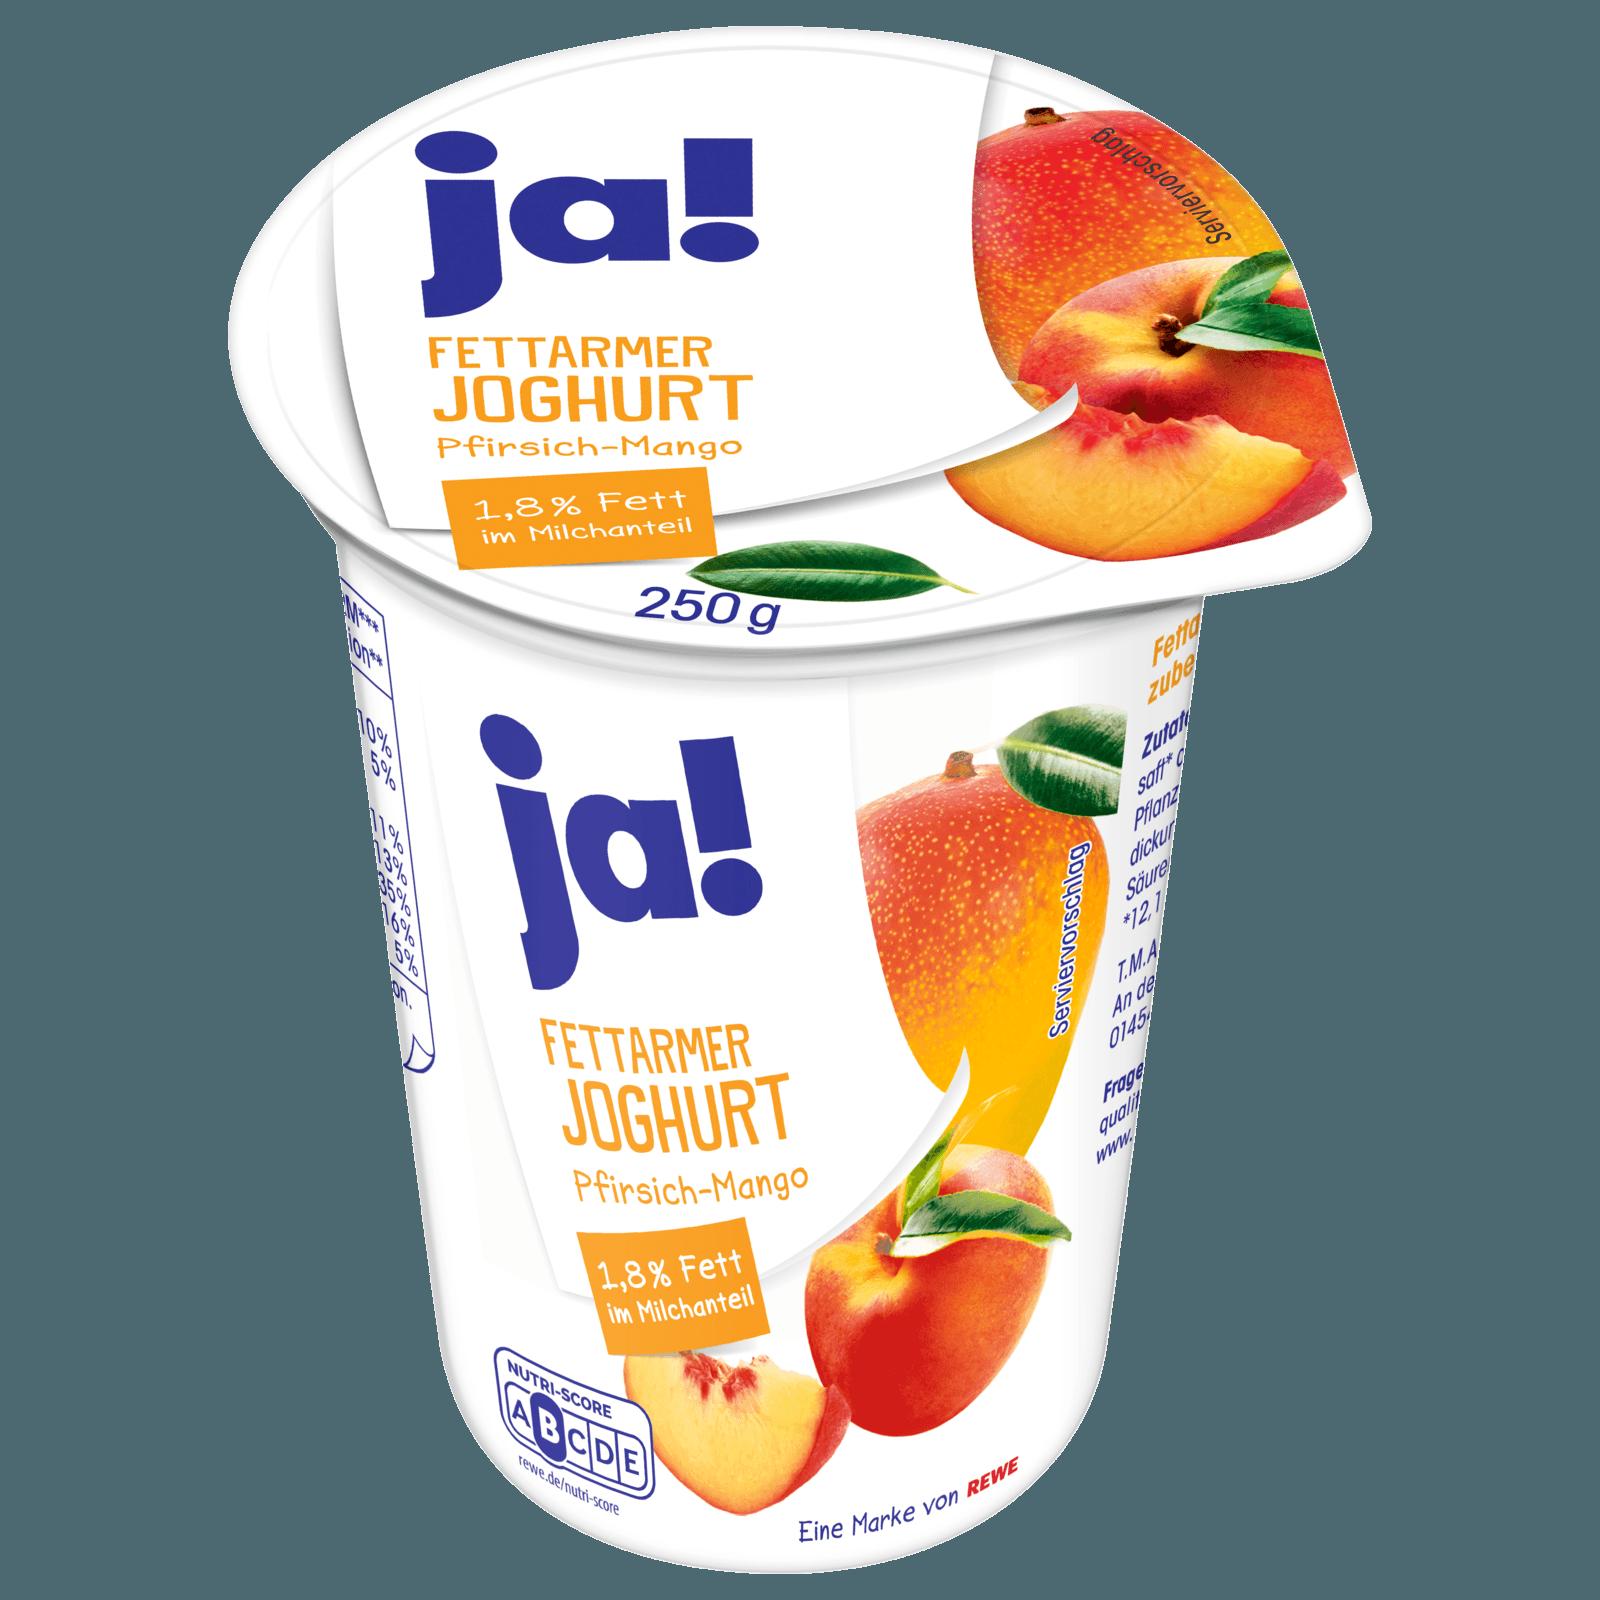 ja! Fettarmer Joghurt mild Pfirsich-Mango 250g